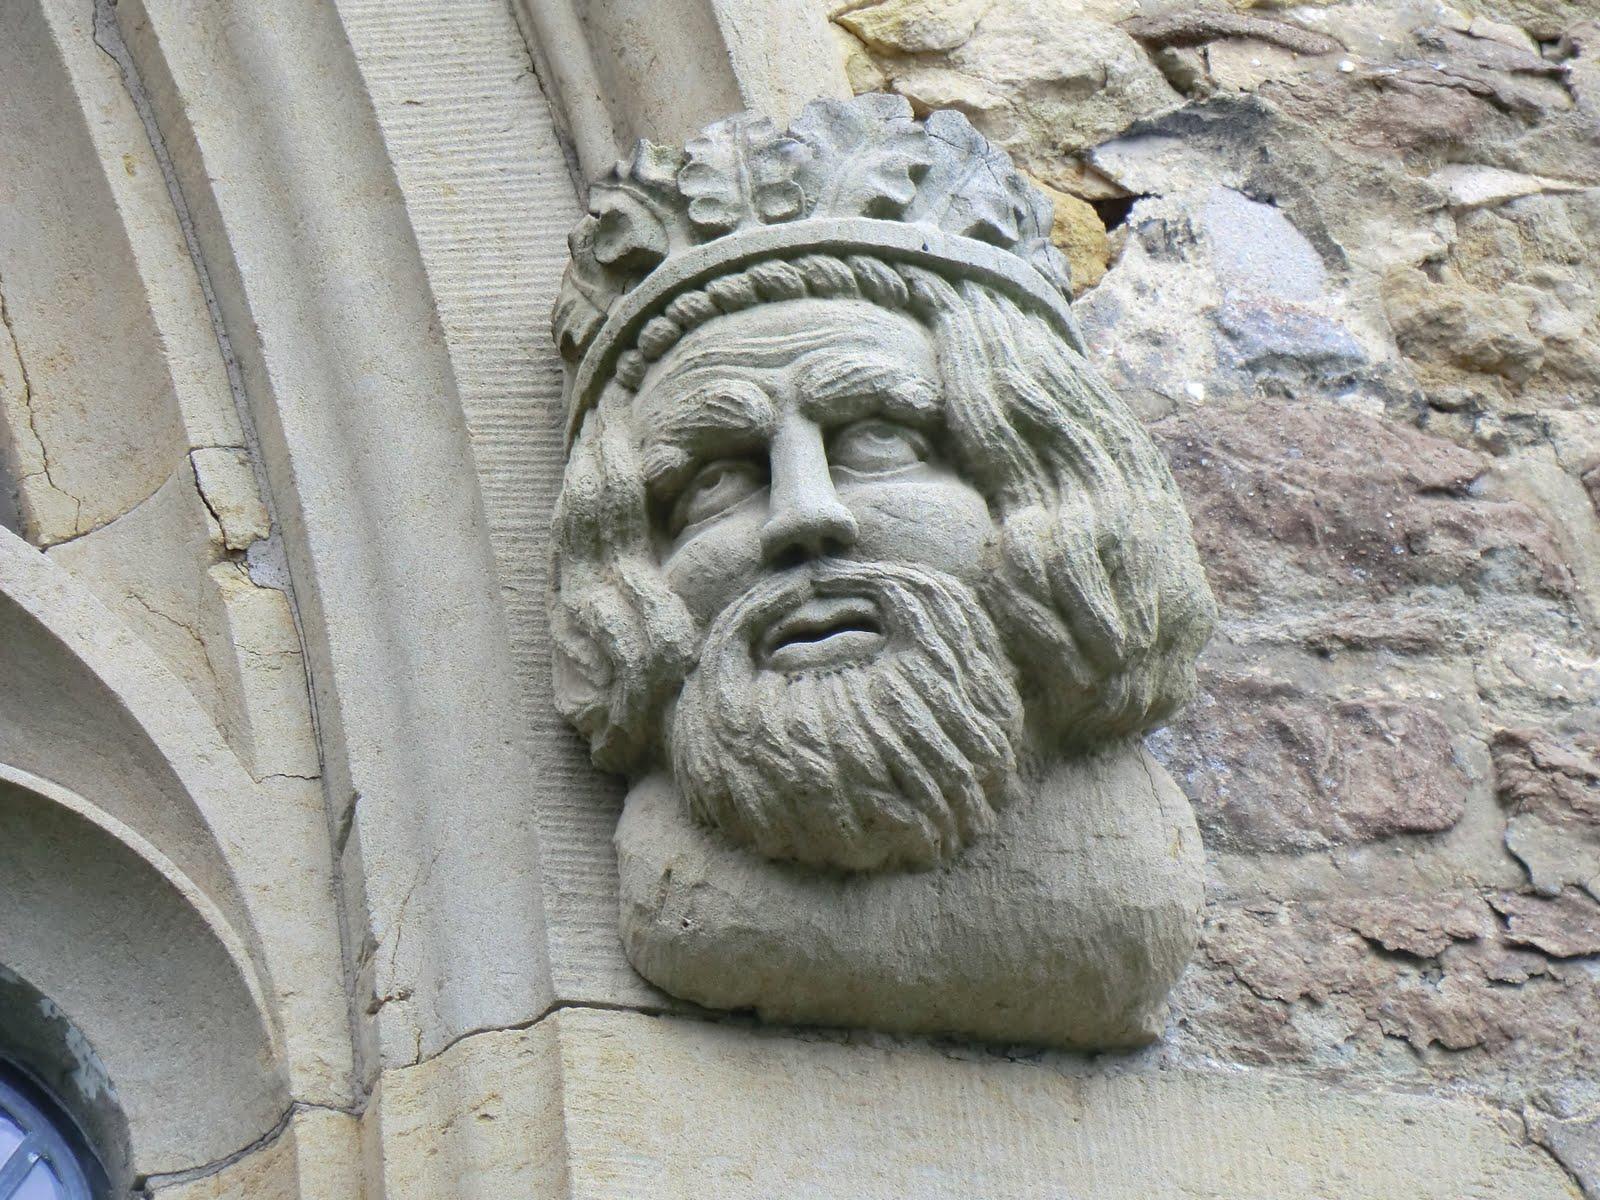 CIMG0333 Gargoyle, Westerham church